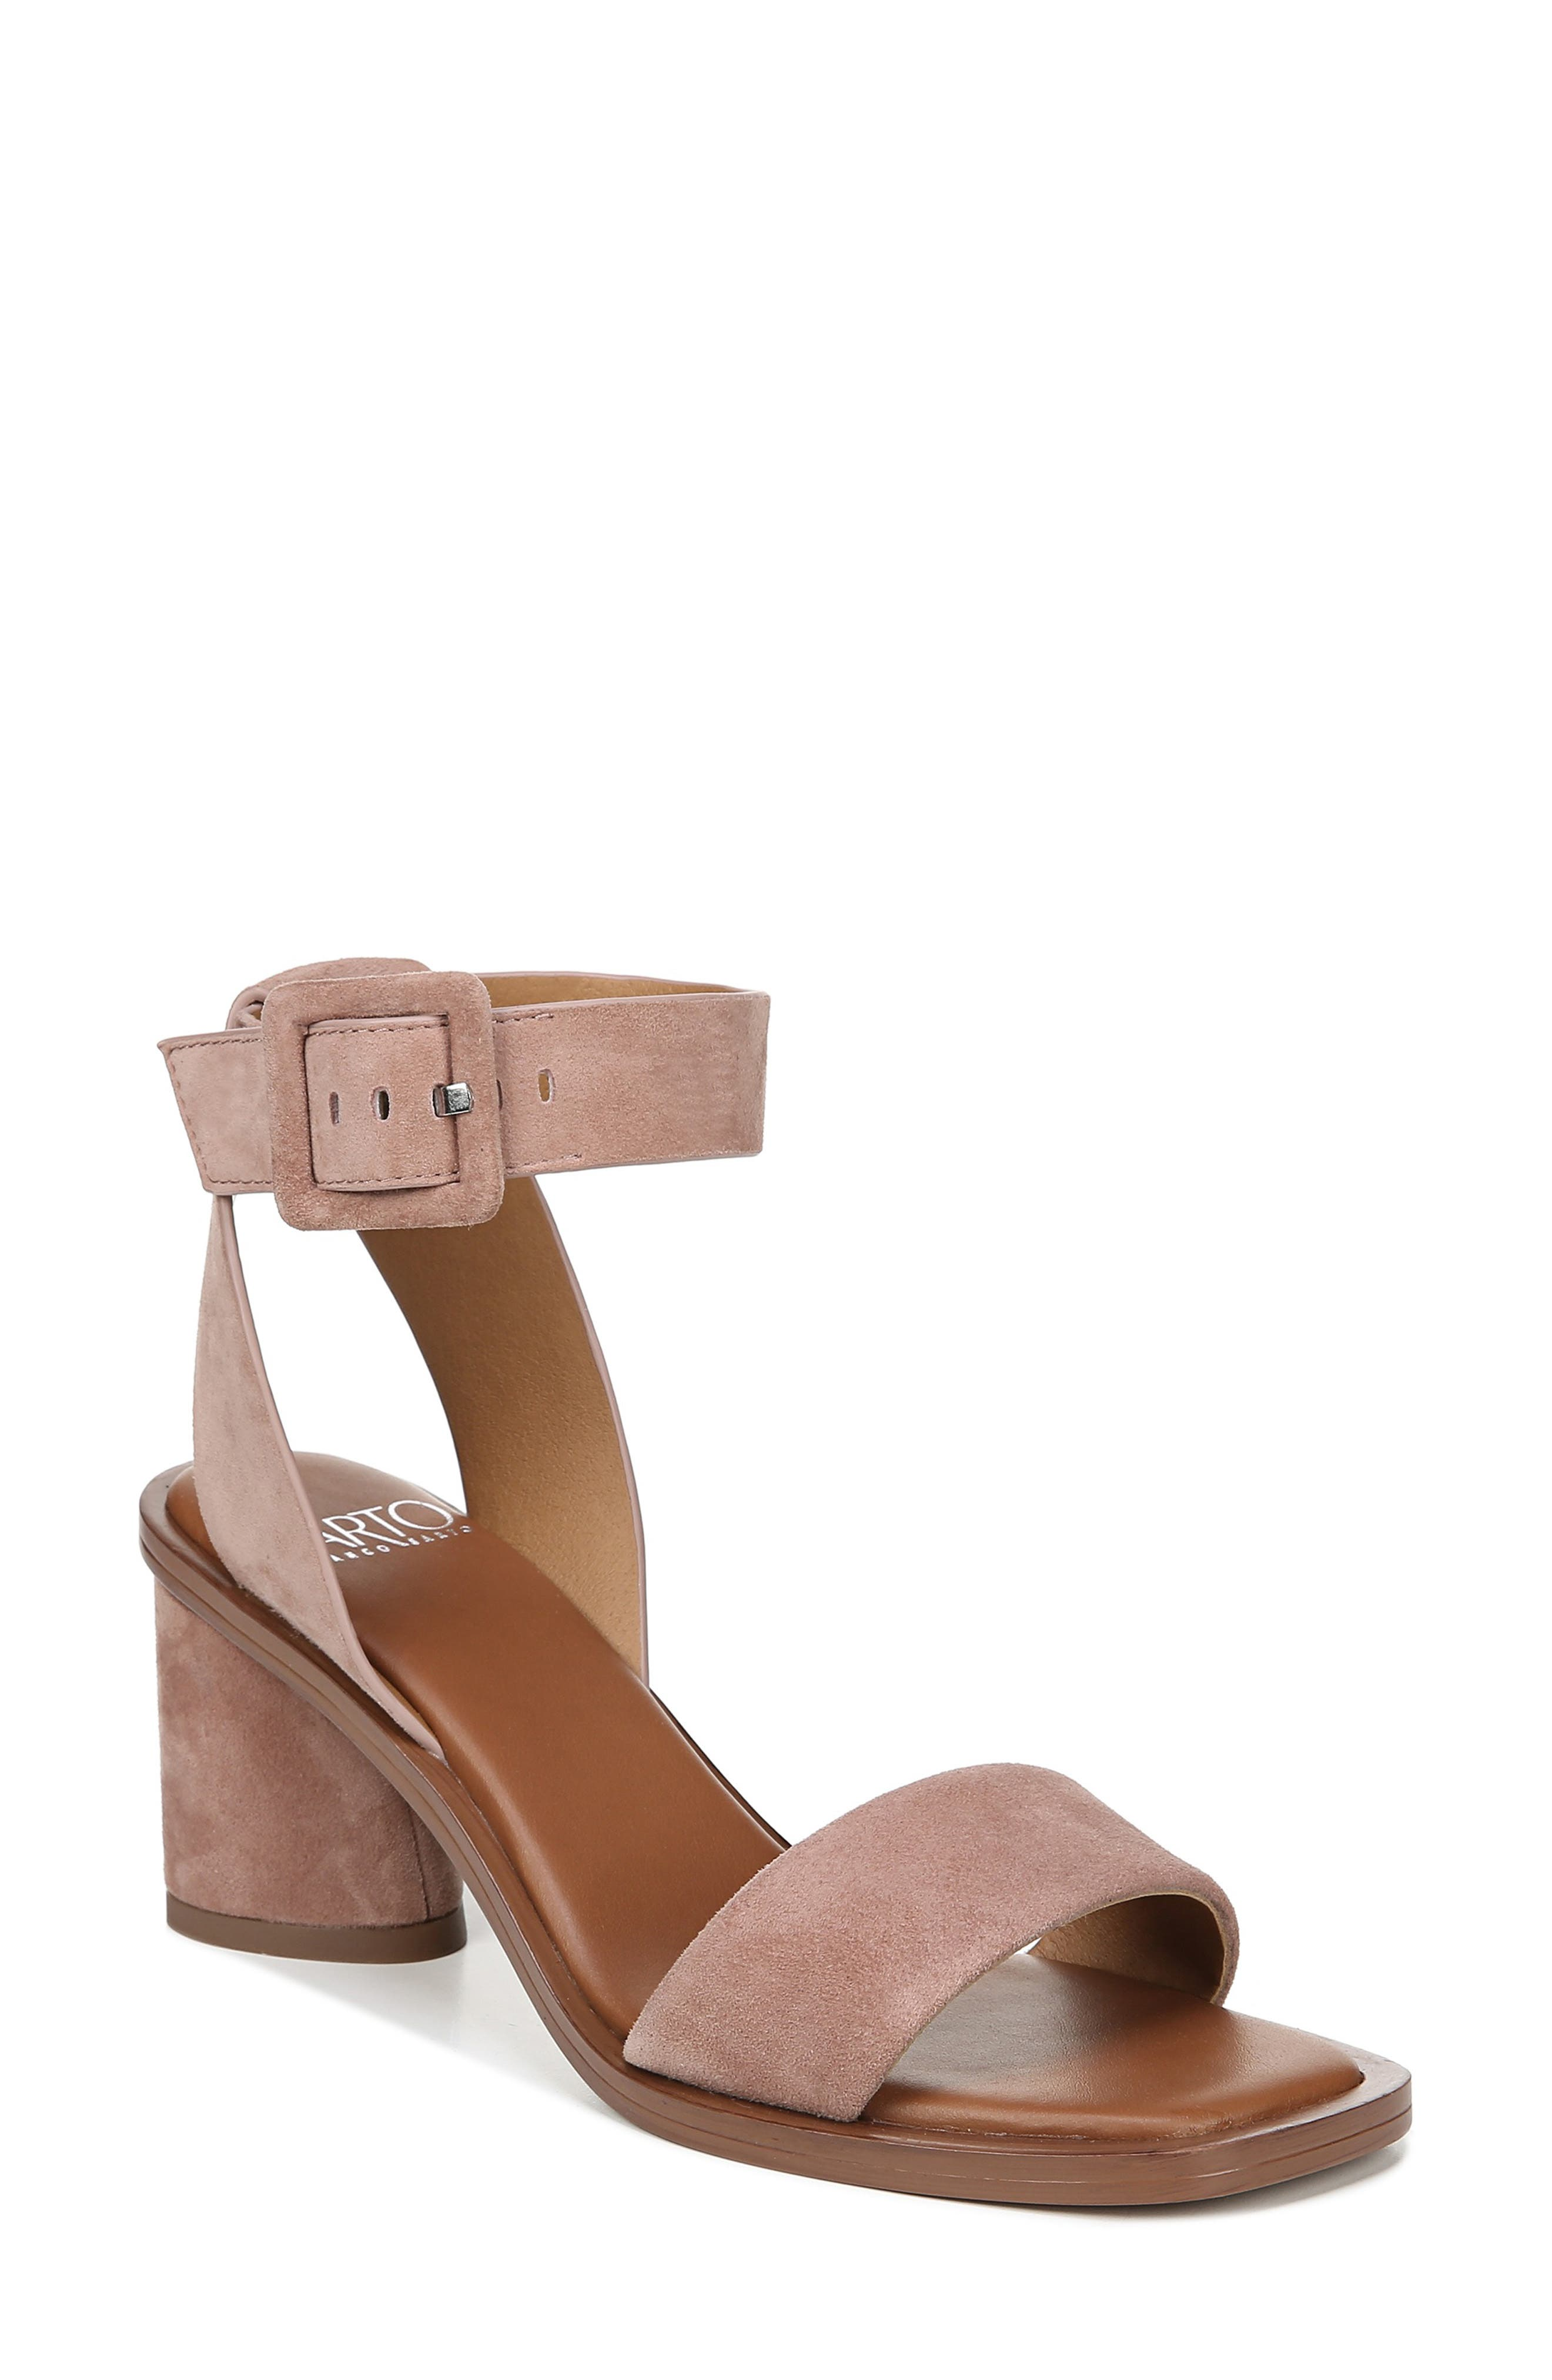 Sarto By Franco Sarto Risa Strap Sandal- Pink